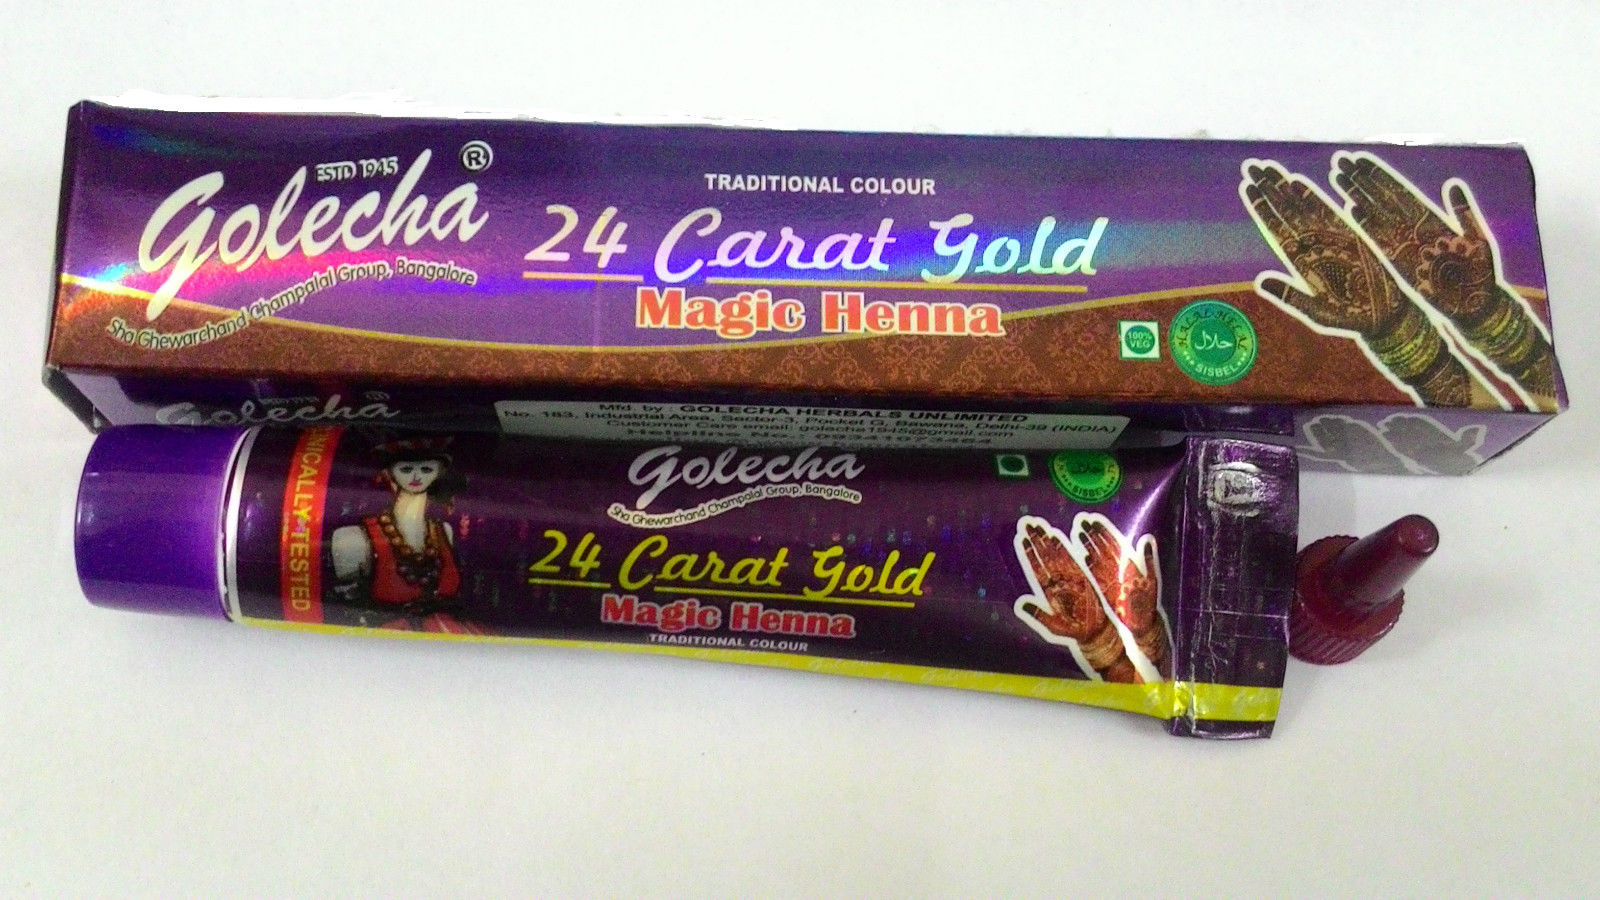 buy Golecha 24 Carat Gold Magic Henna Purple Tubes (Pack of 12) in UK & USA